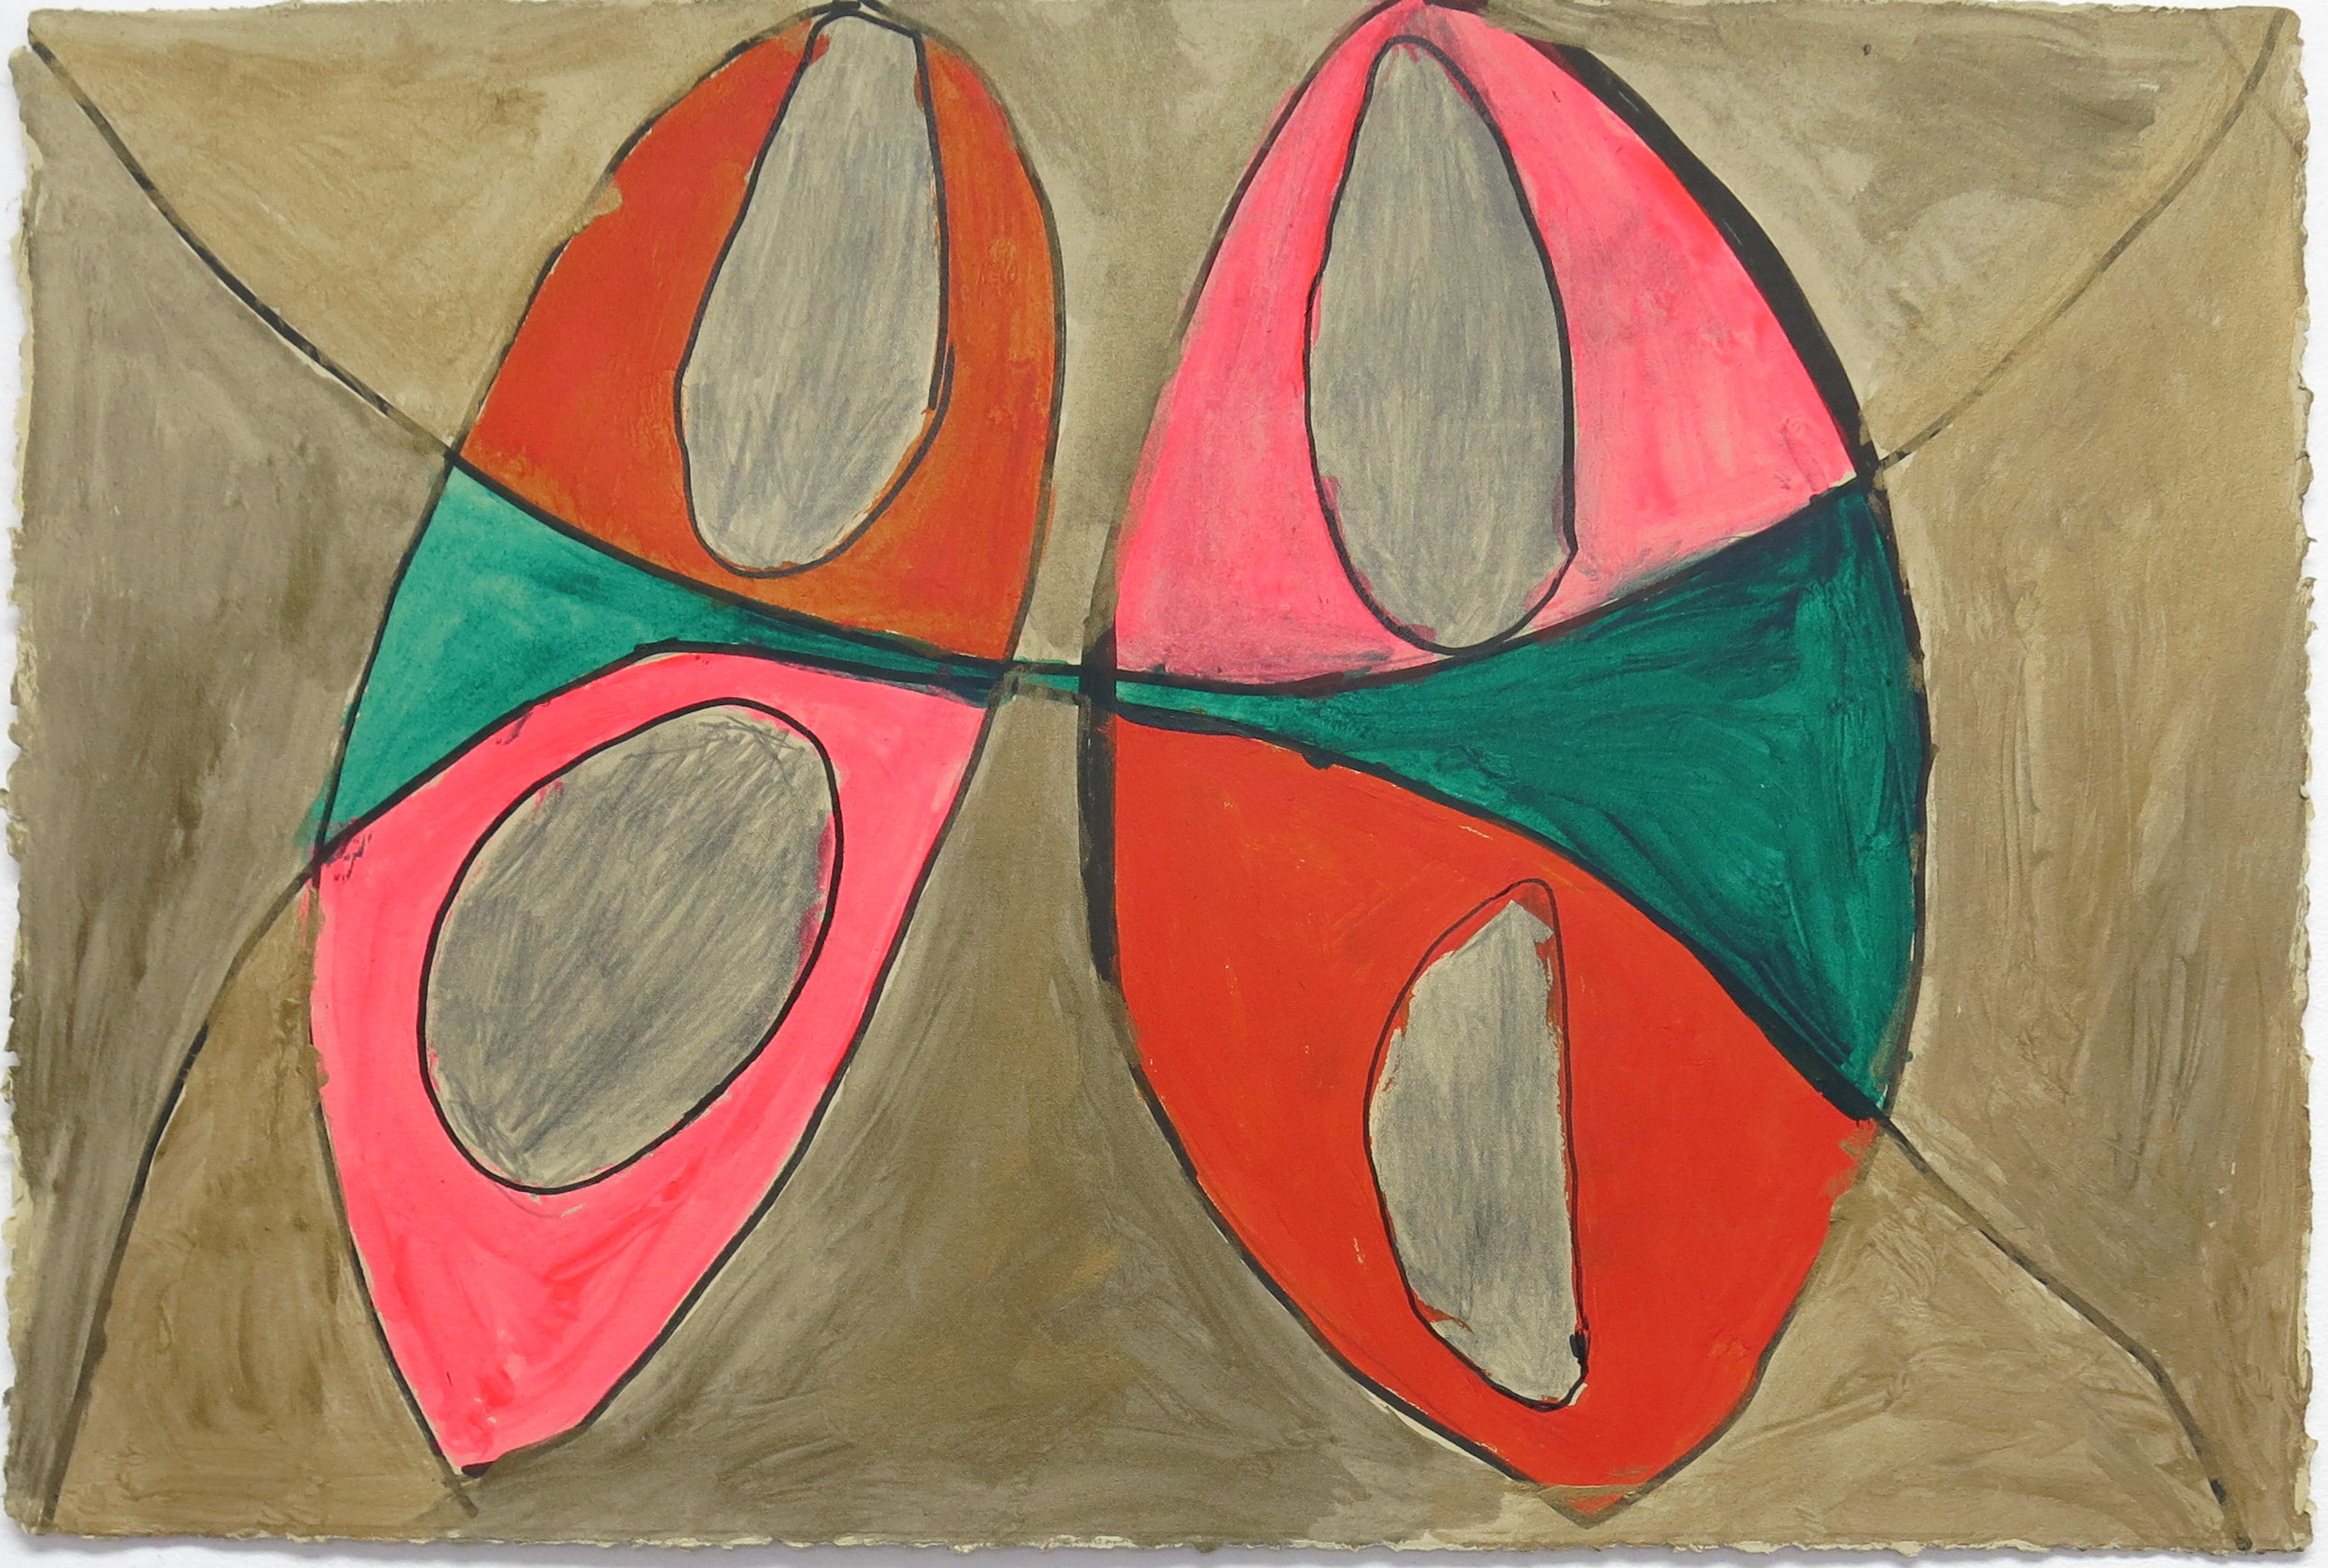 Allan Lofberg, Untitled (ALo 024), 2014, 15 x 22 inches